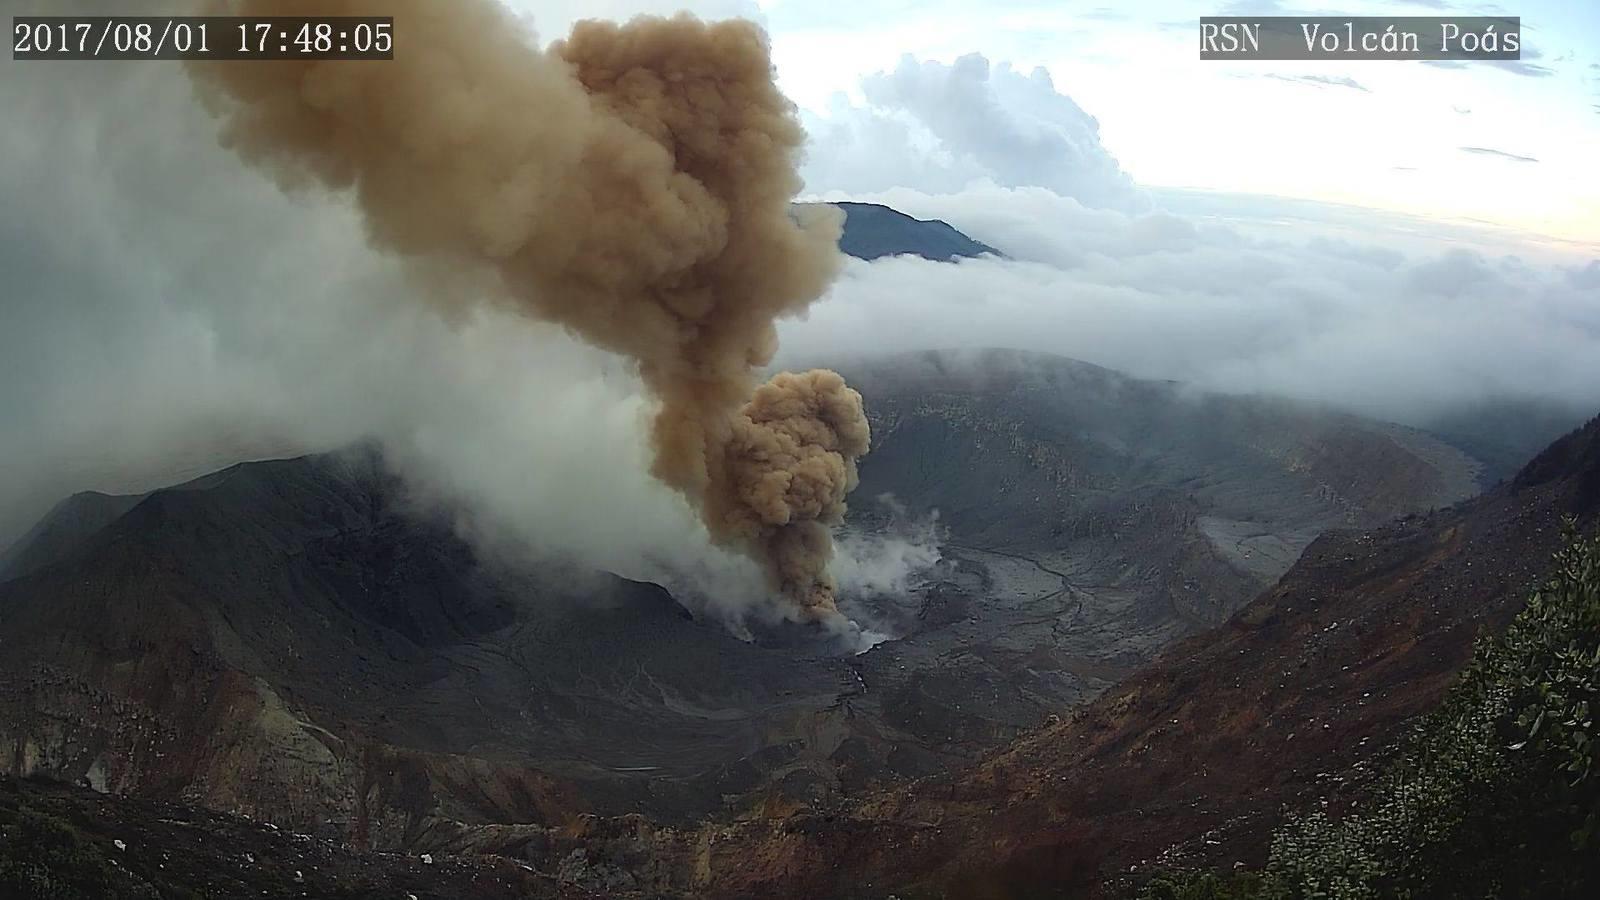 Poas volcano eruption on August 1 2017, Poas volcano eruption on August 1 2017 picture, Poas volcano eruption on August 1 2017 video